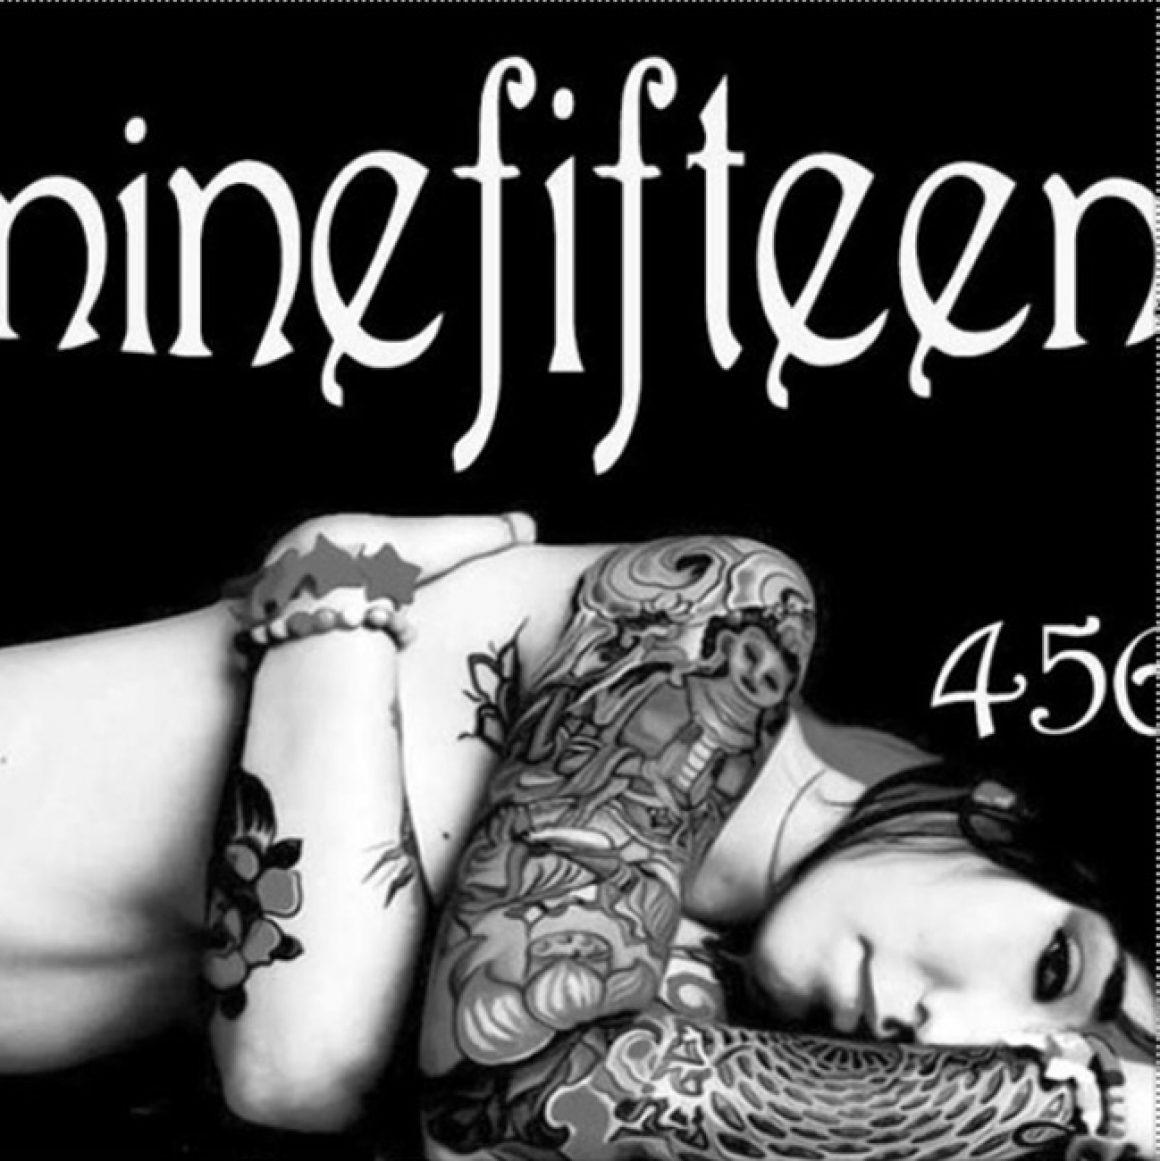 ninefifteen